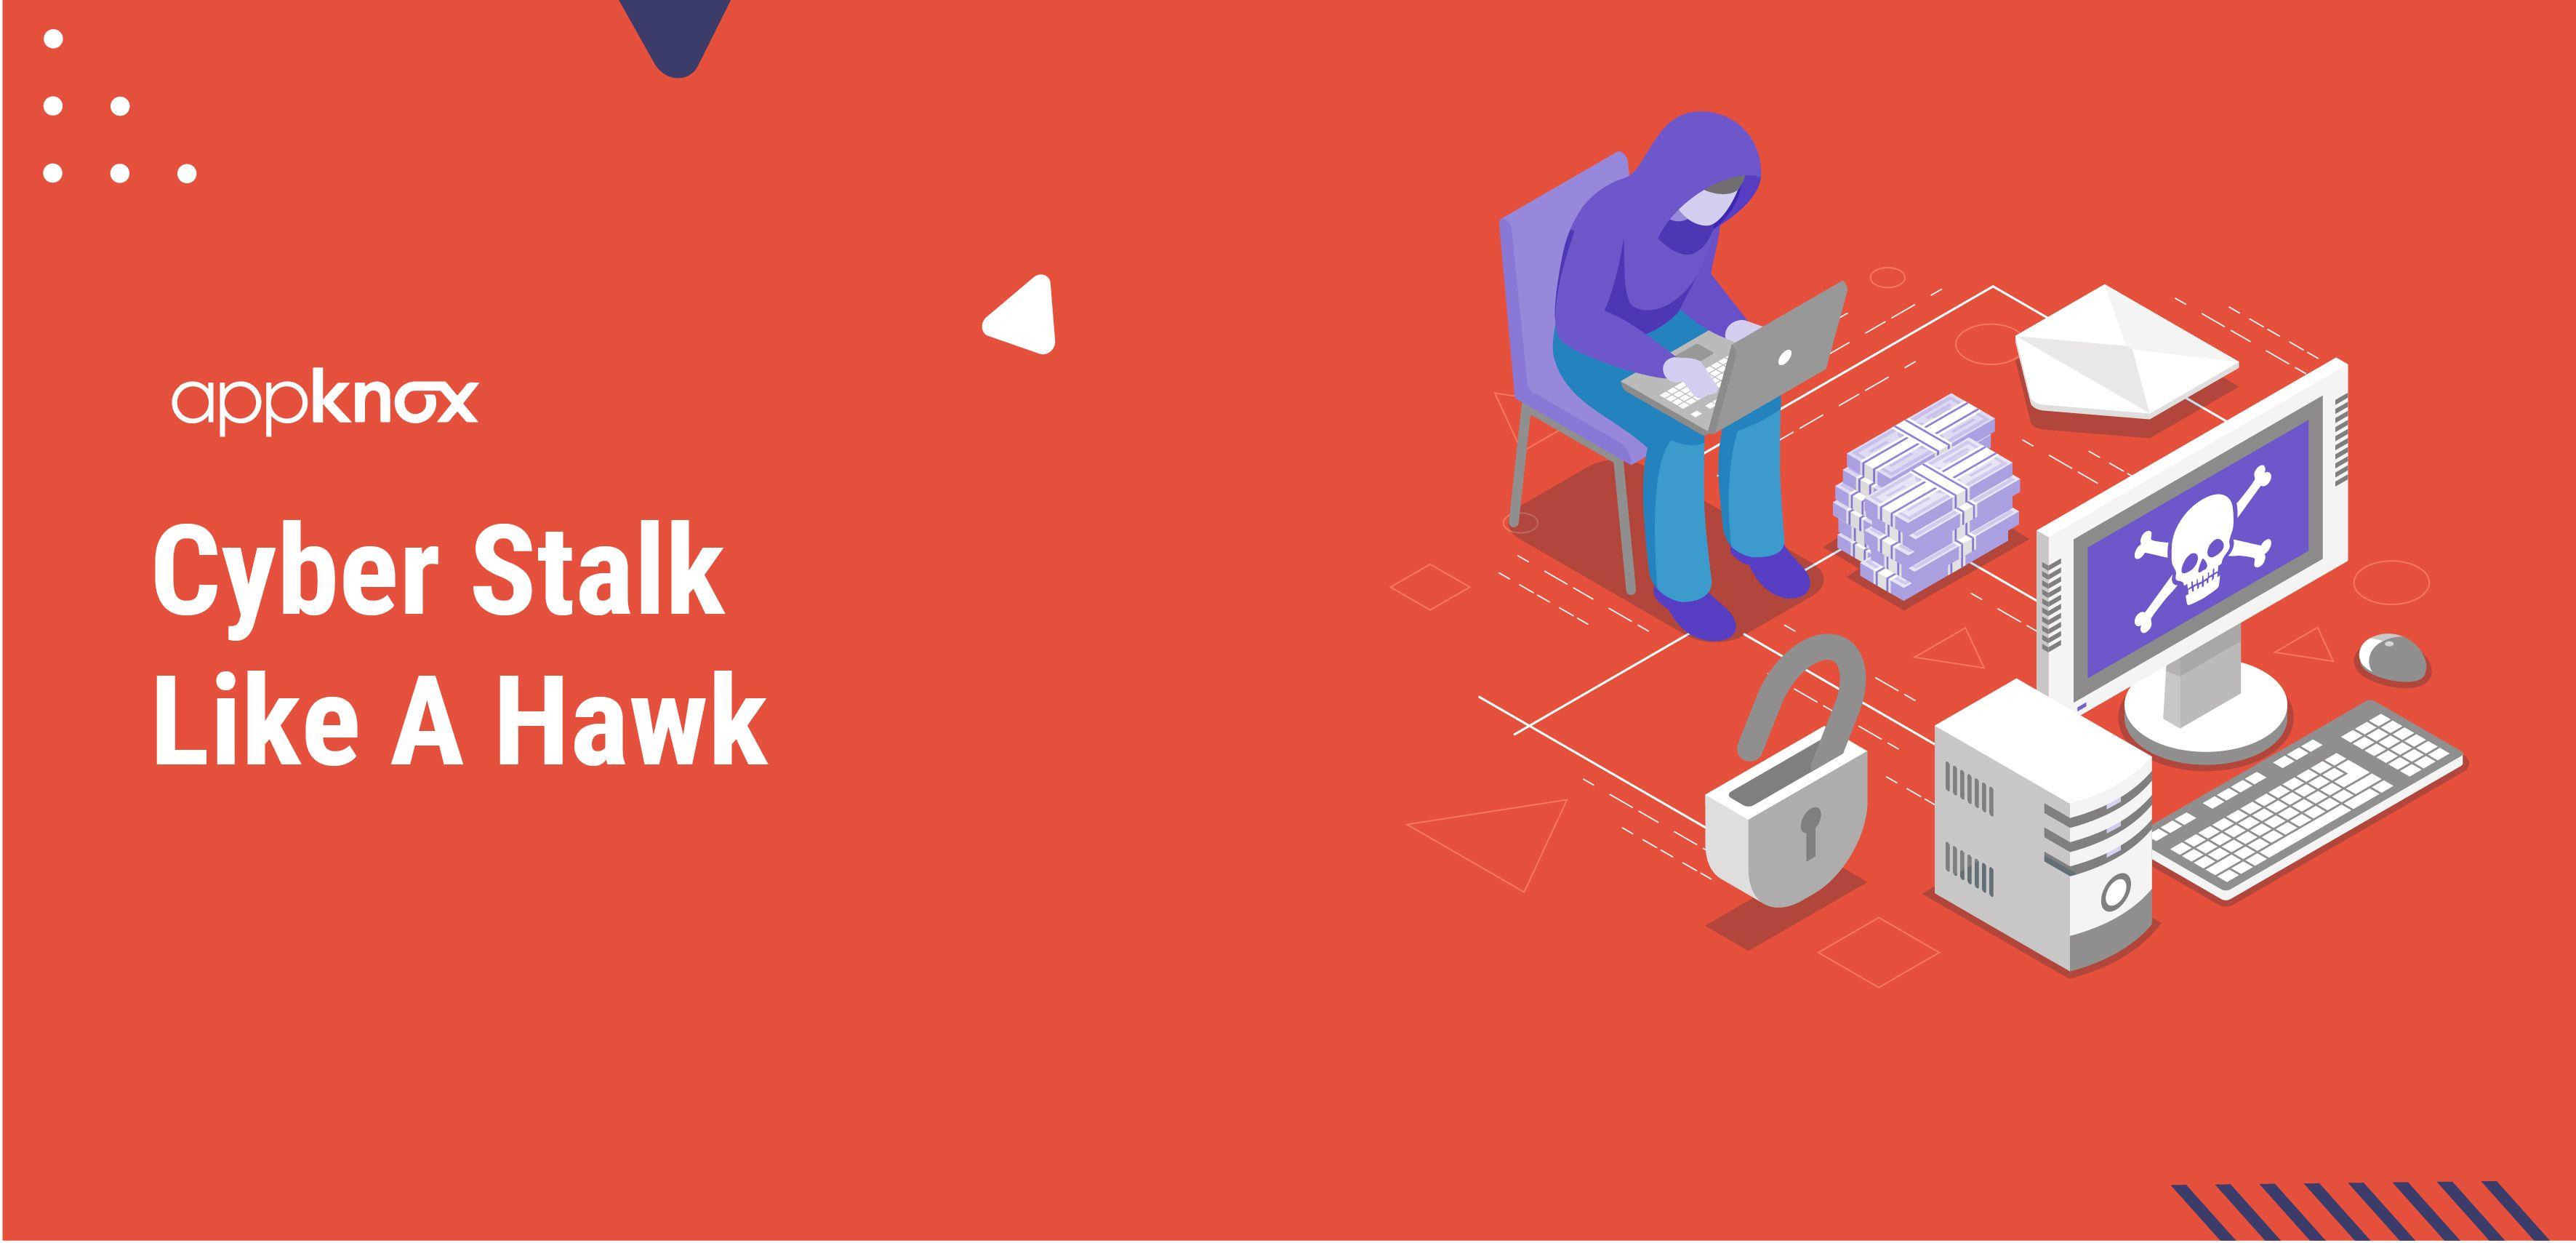 Cyber Stalk Like A Hawk